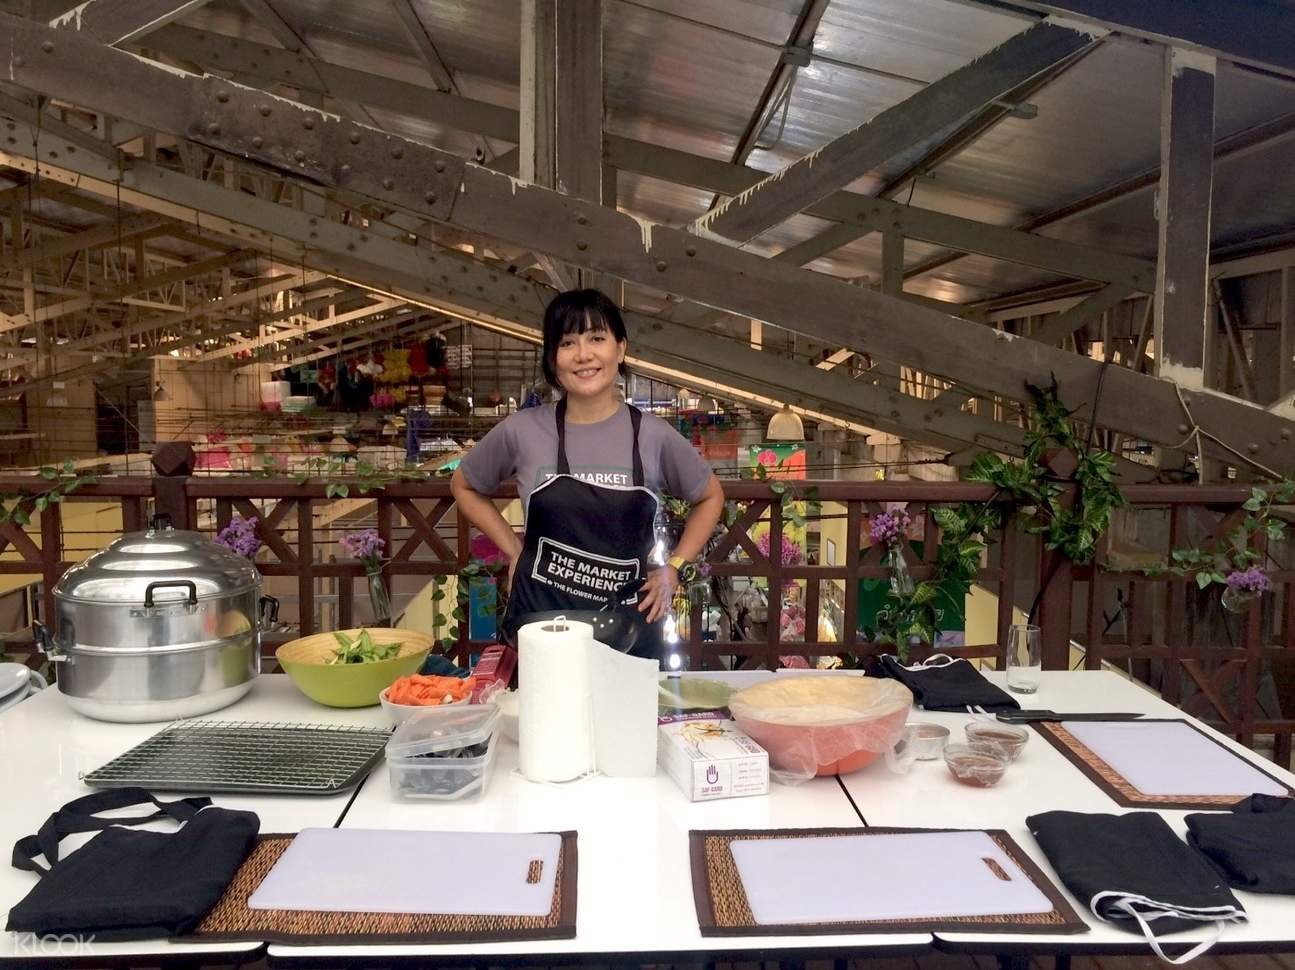 [The Market Experience] 泰式烹饪课